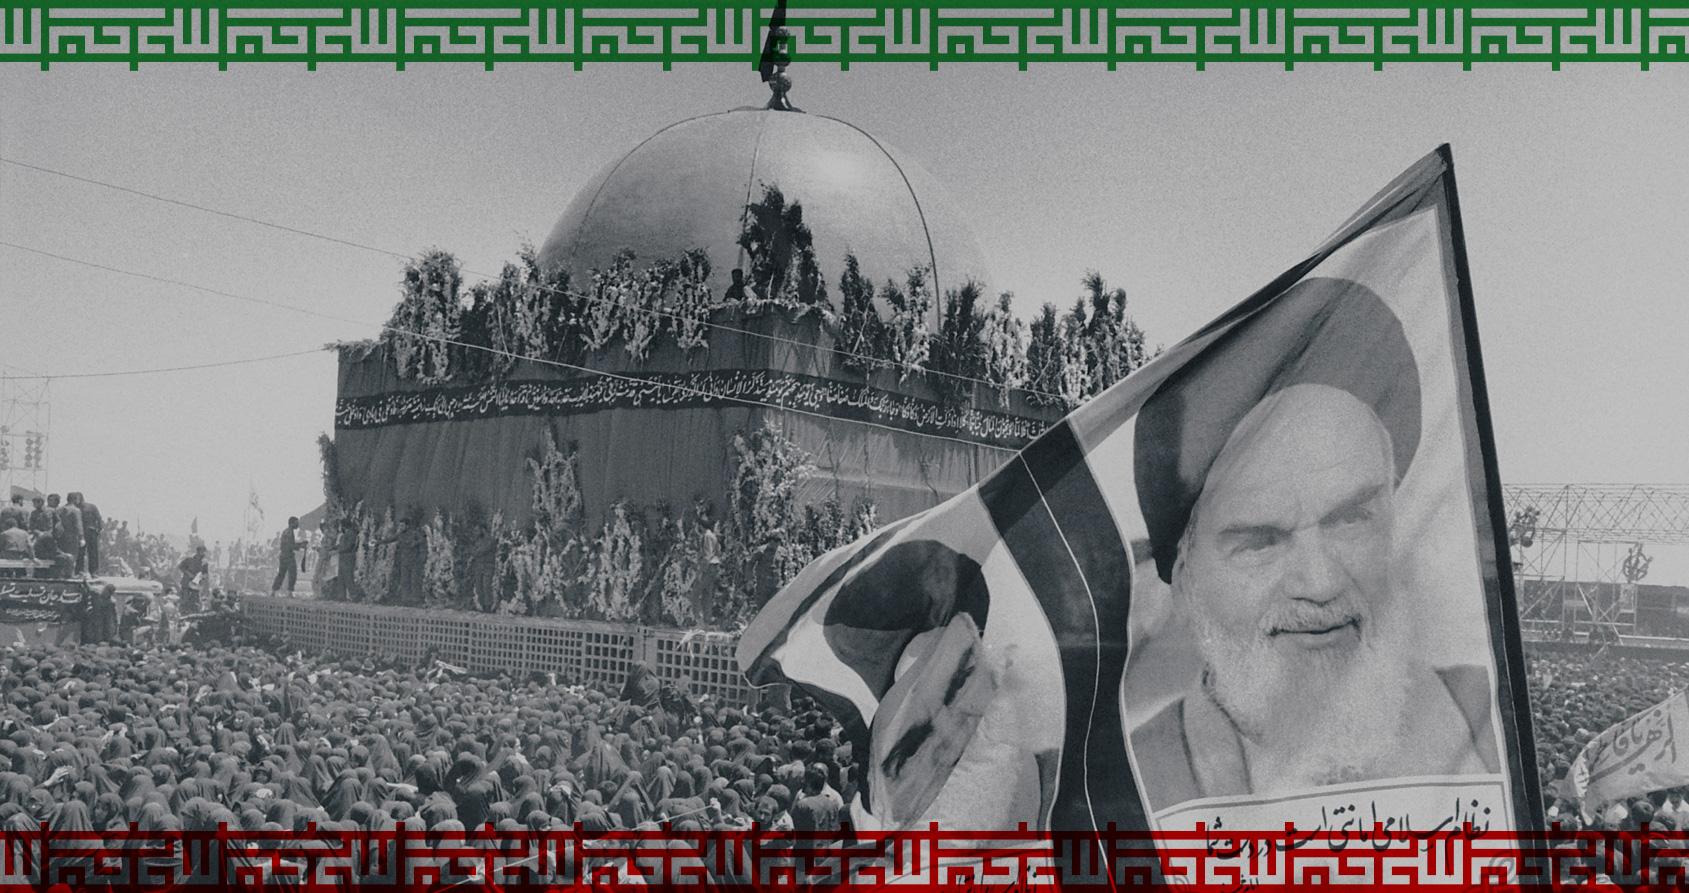 ulyces-iranrevolution-couv05